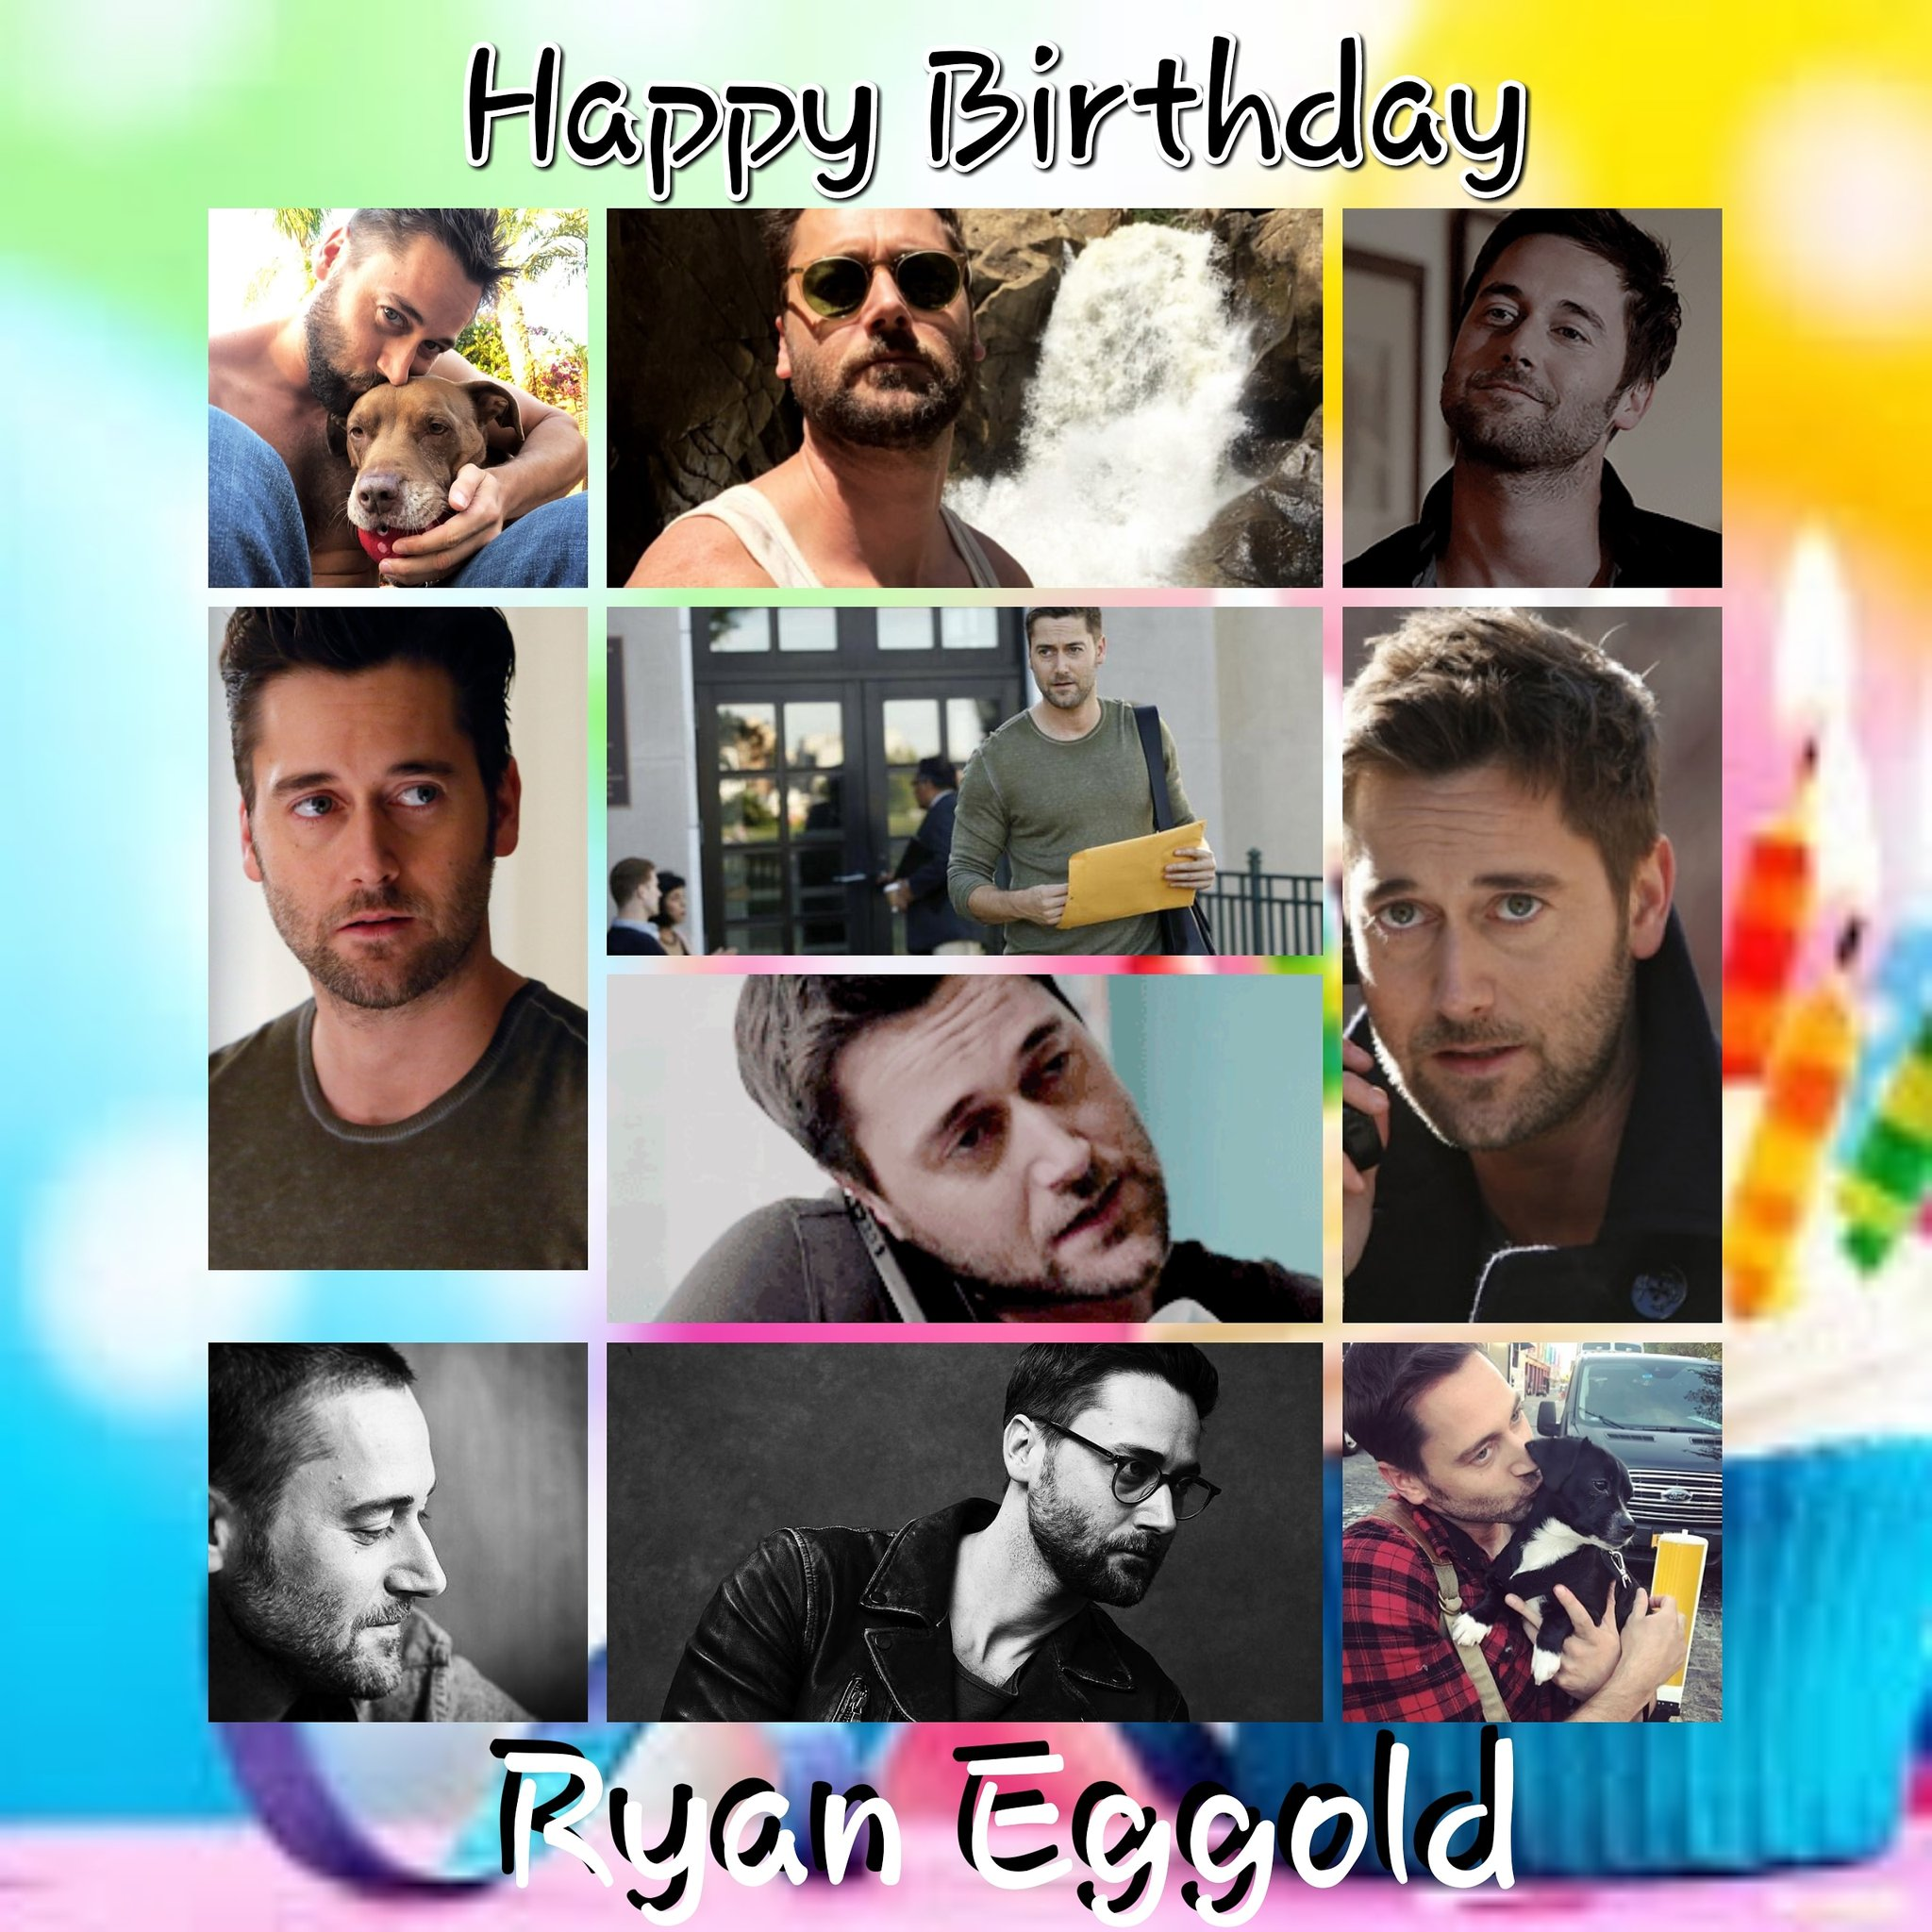 Happy birthday Ryan Eggold